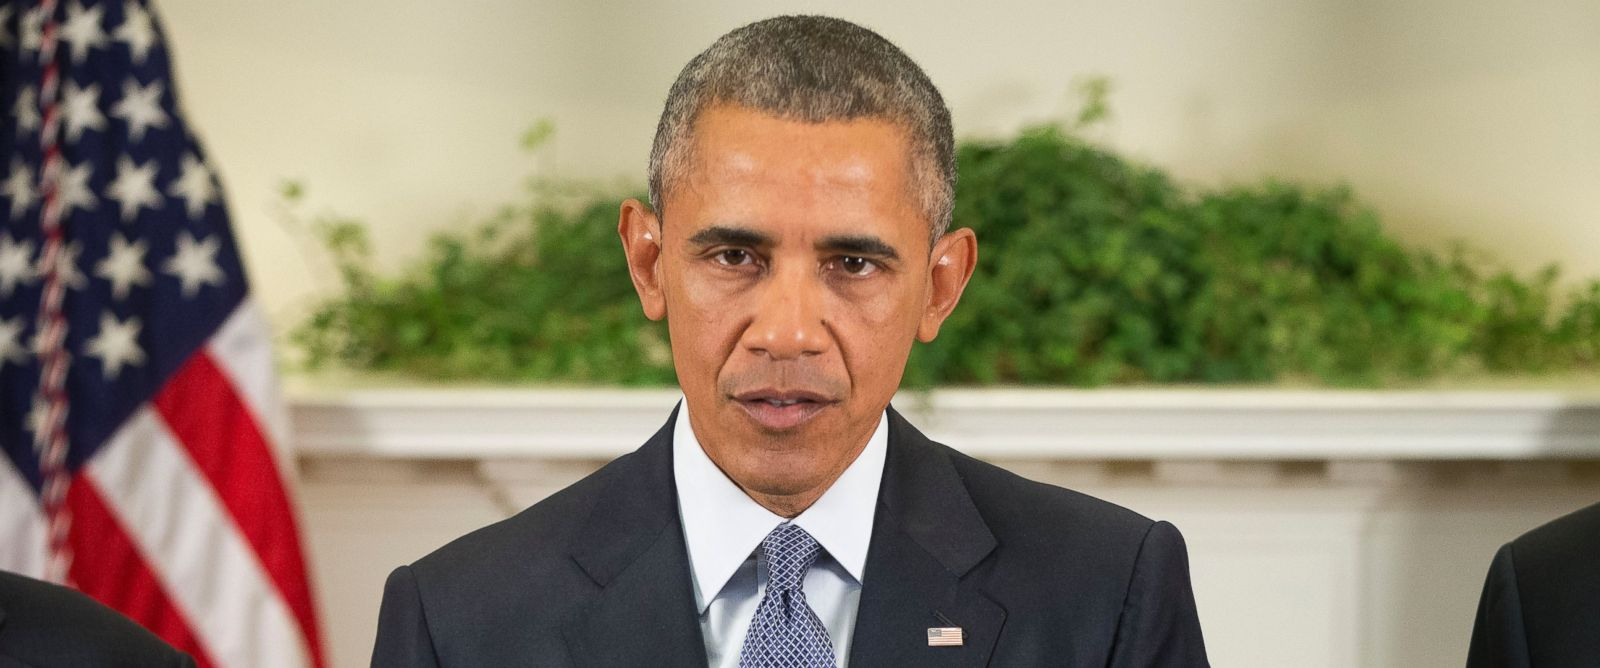 PHOTO: President Barack Obama speaks in the Roosevelt Room of the White House in Washington, Oct. 15, 2015.